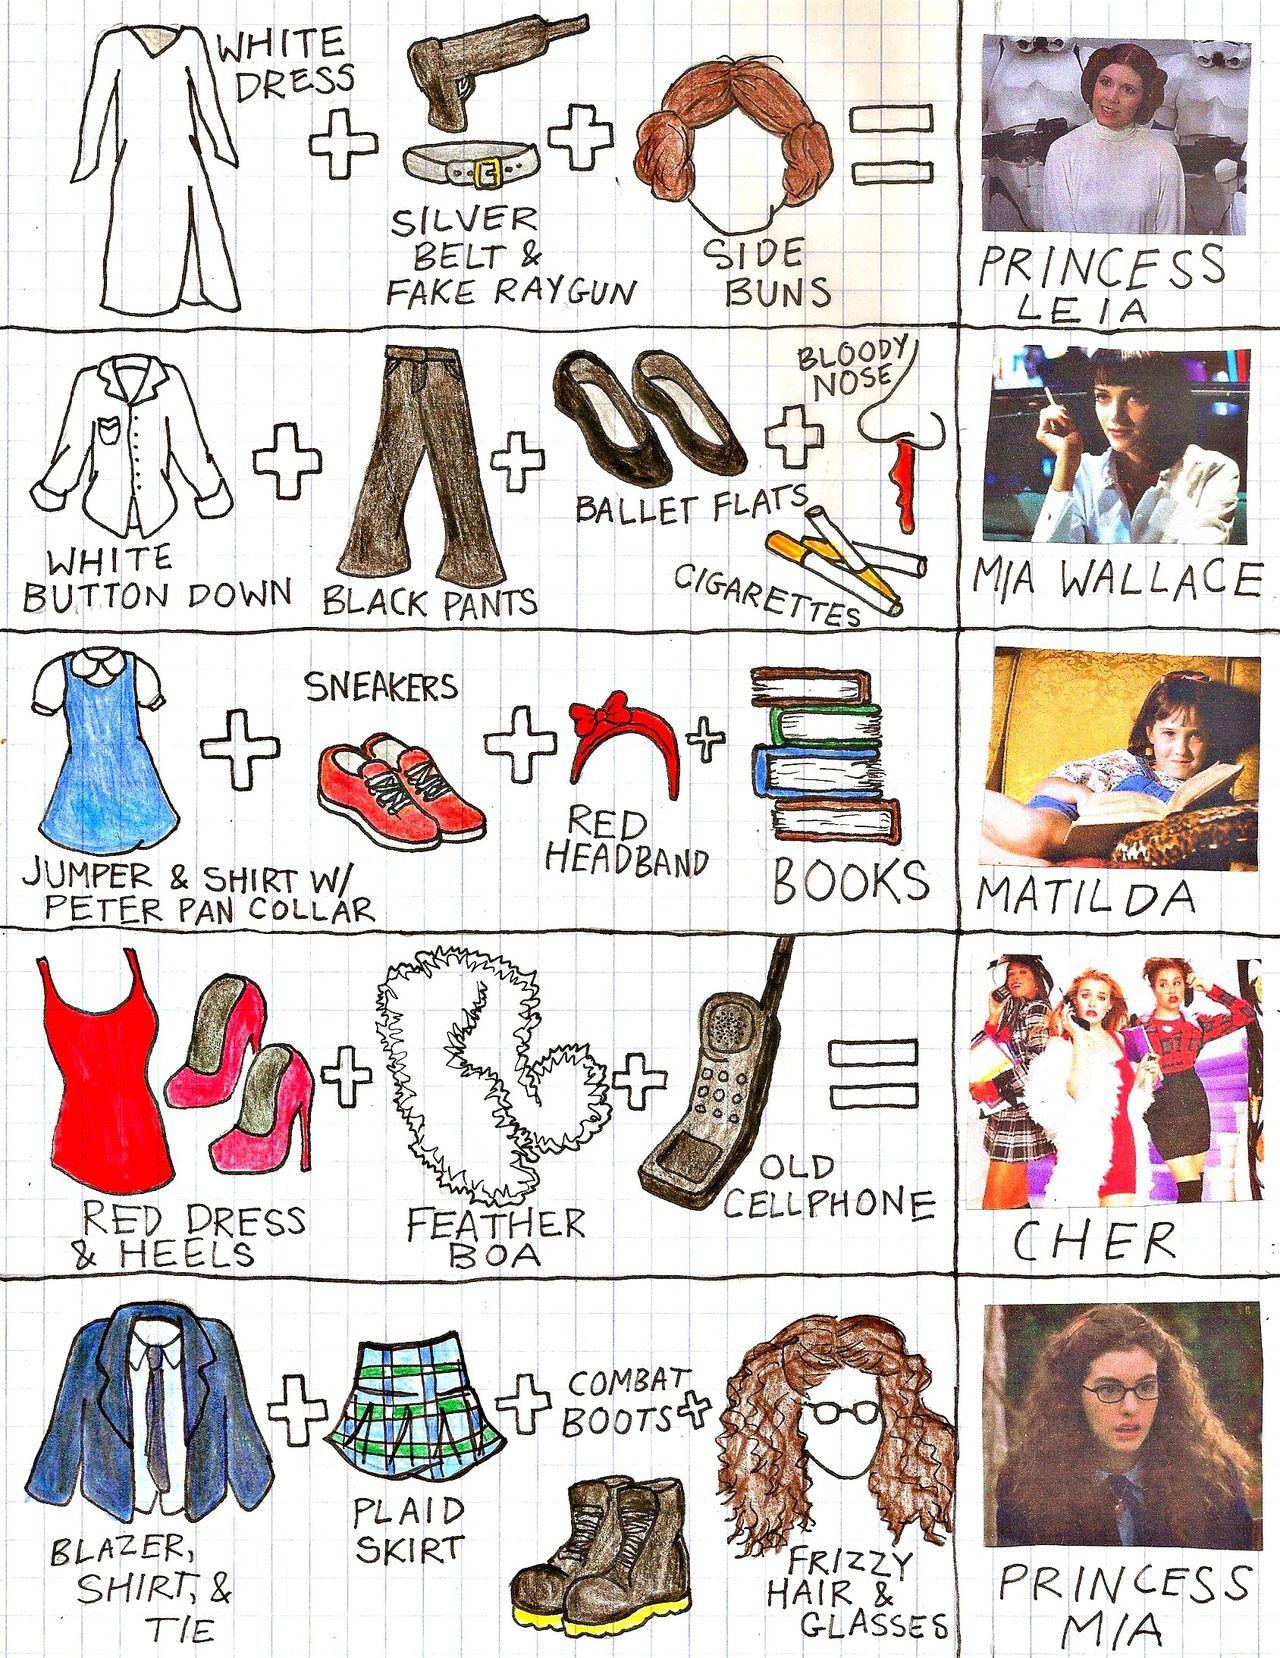 Last Minute Halloween Costumes Red Head Halloween Costumes Cartoon Halloween Costumes Last Minute Halloween Costumes